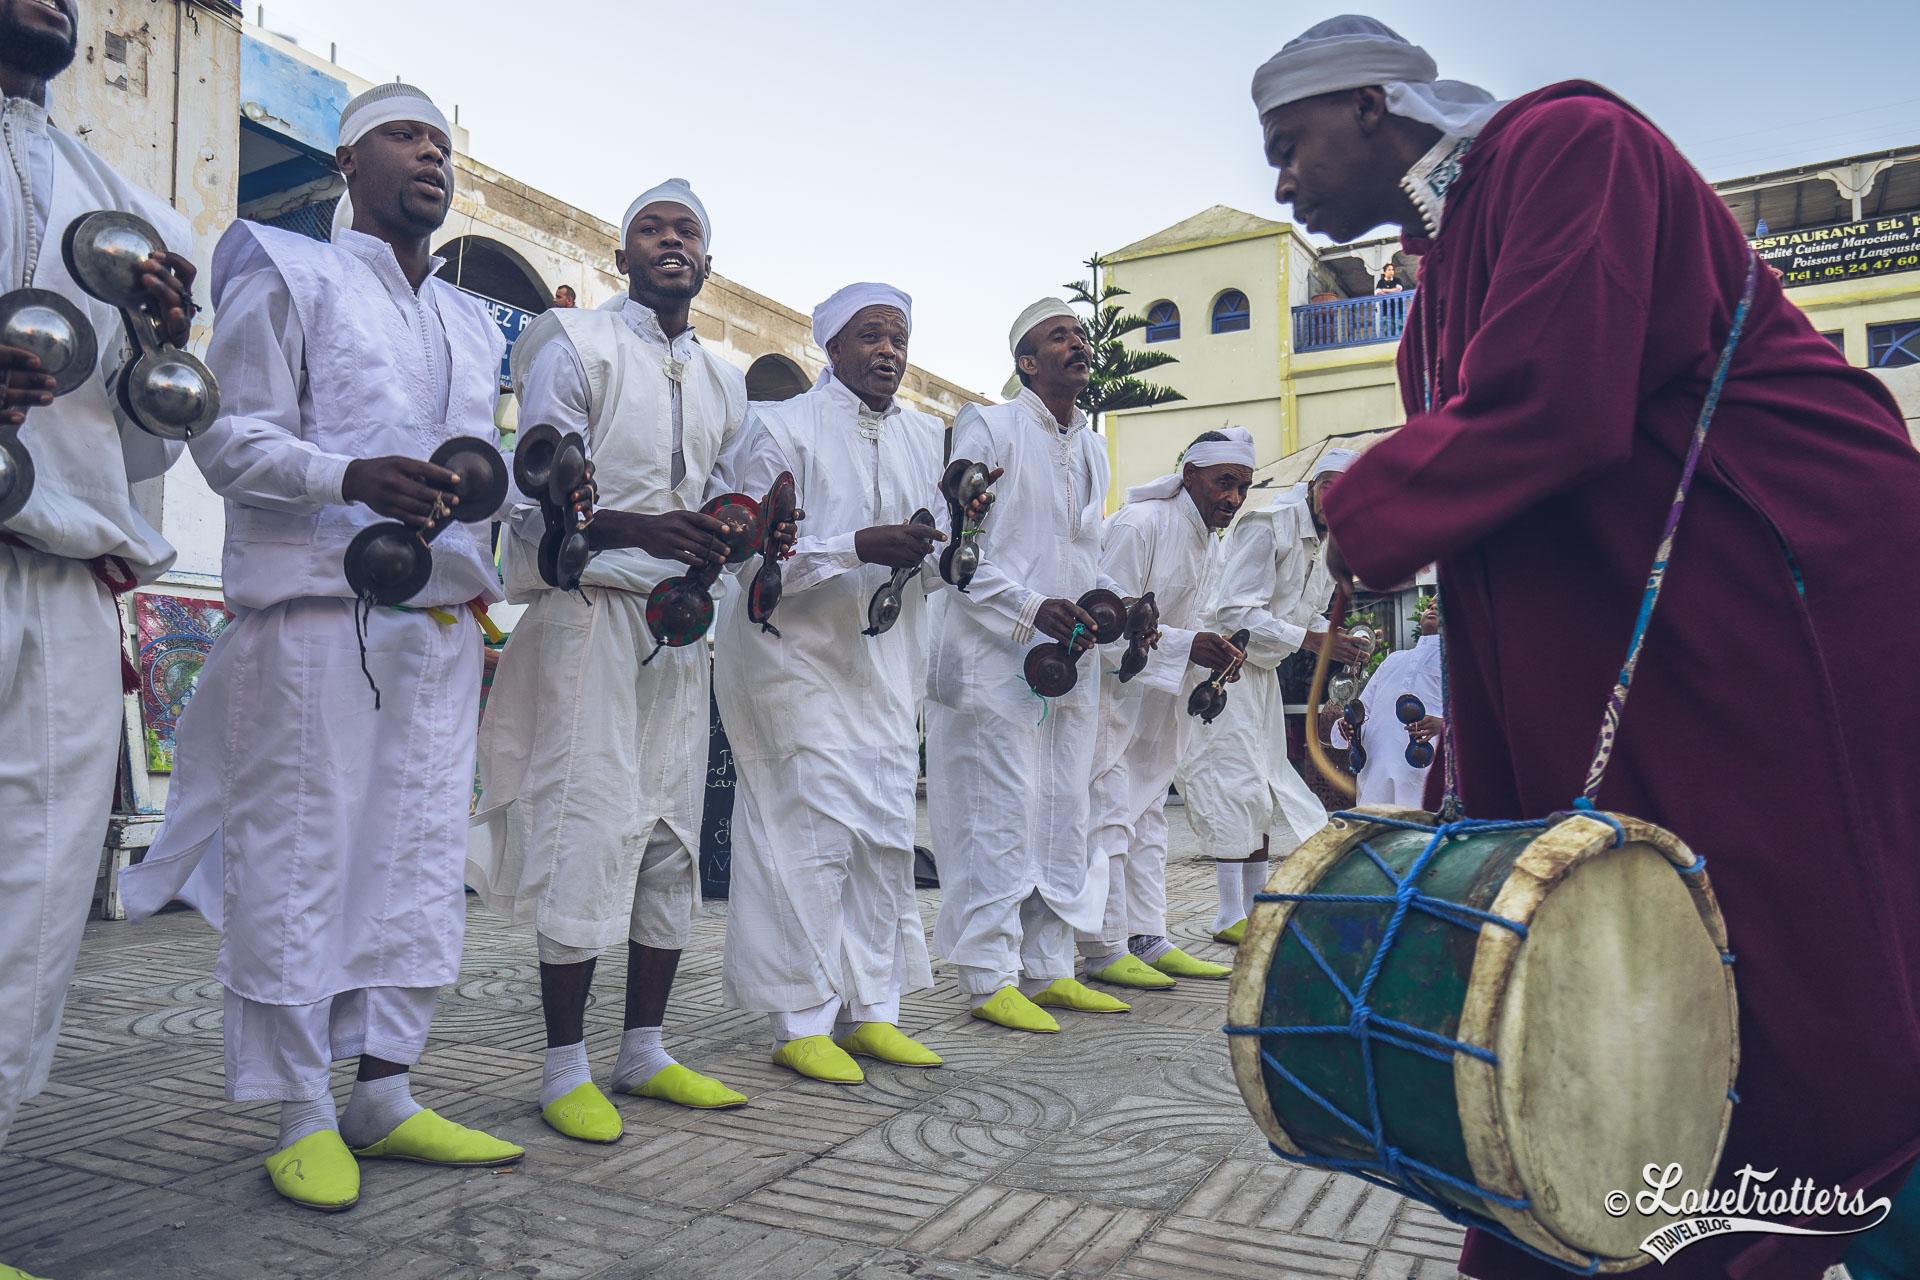 Groupe gnaoua à Essaouira